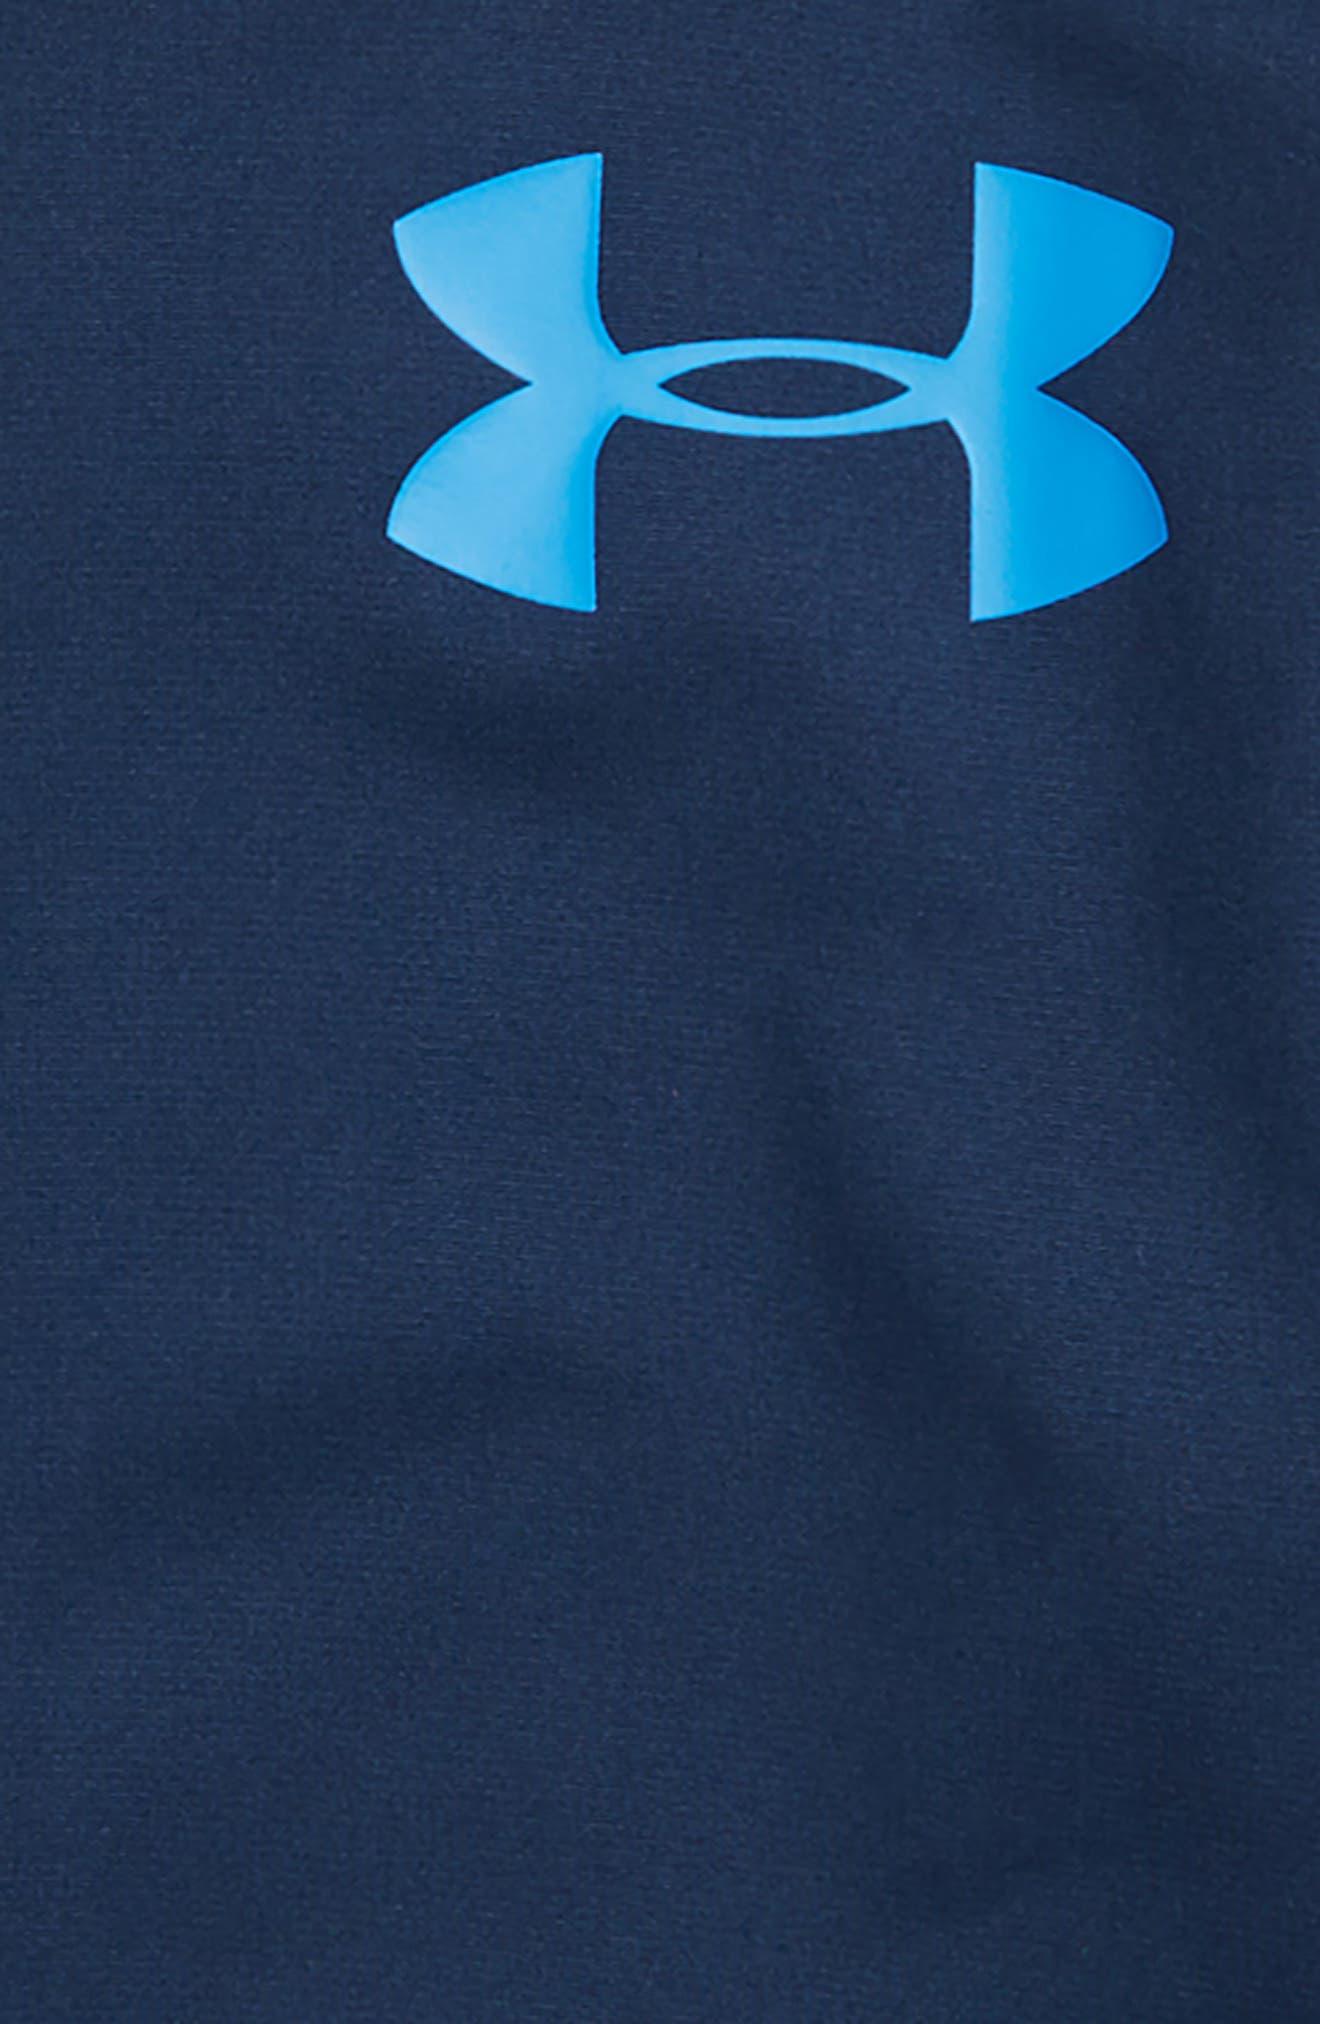 Pennant 2.0 Jacket,                             Alternate thumbnail 2, color,                             ACADEMY / / BLUE CIRCUIT